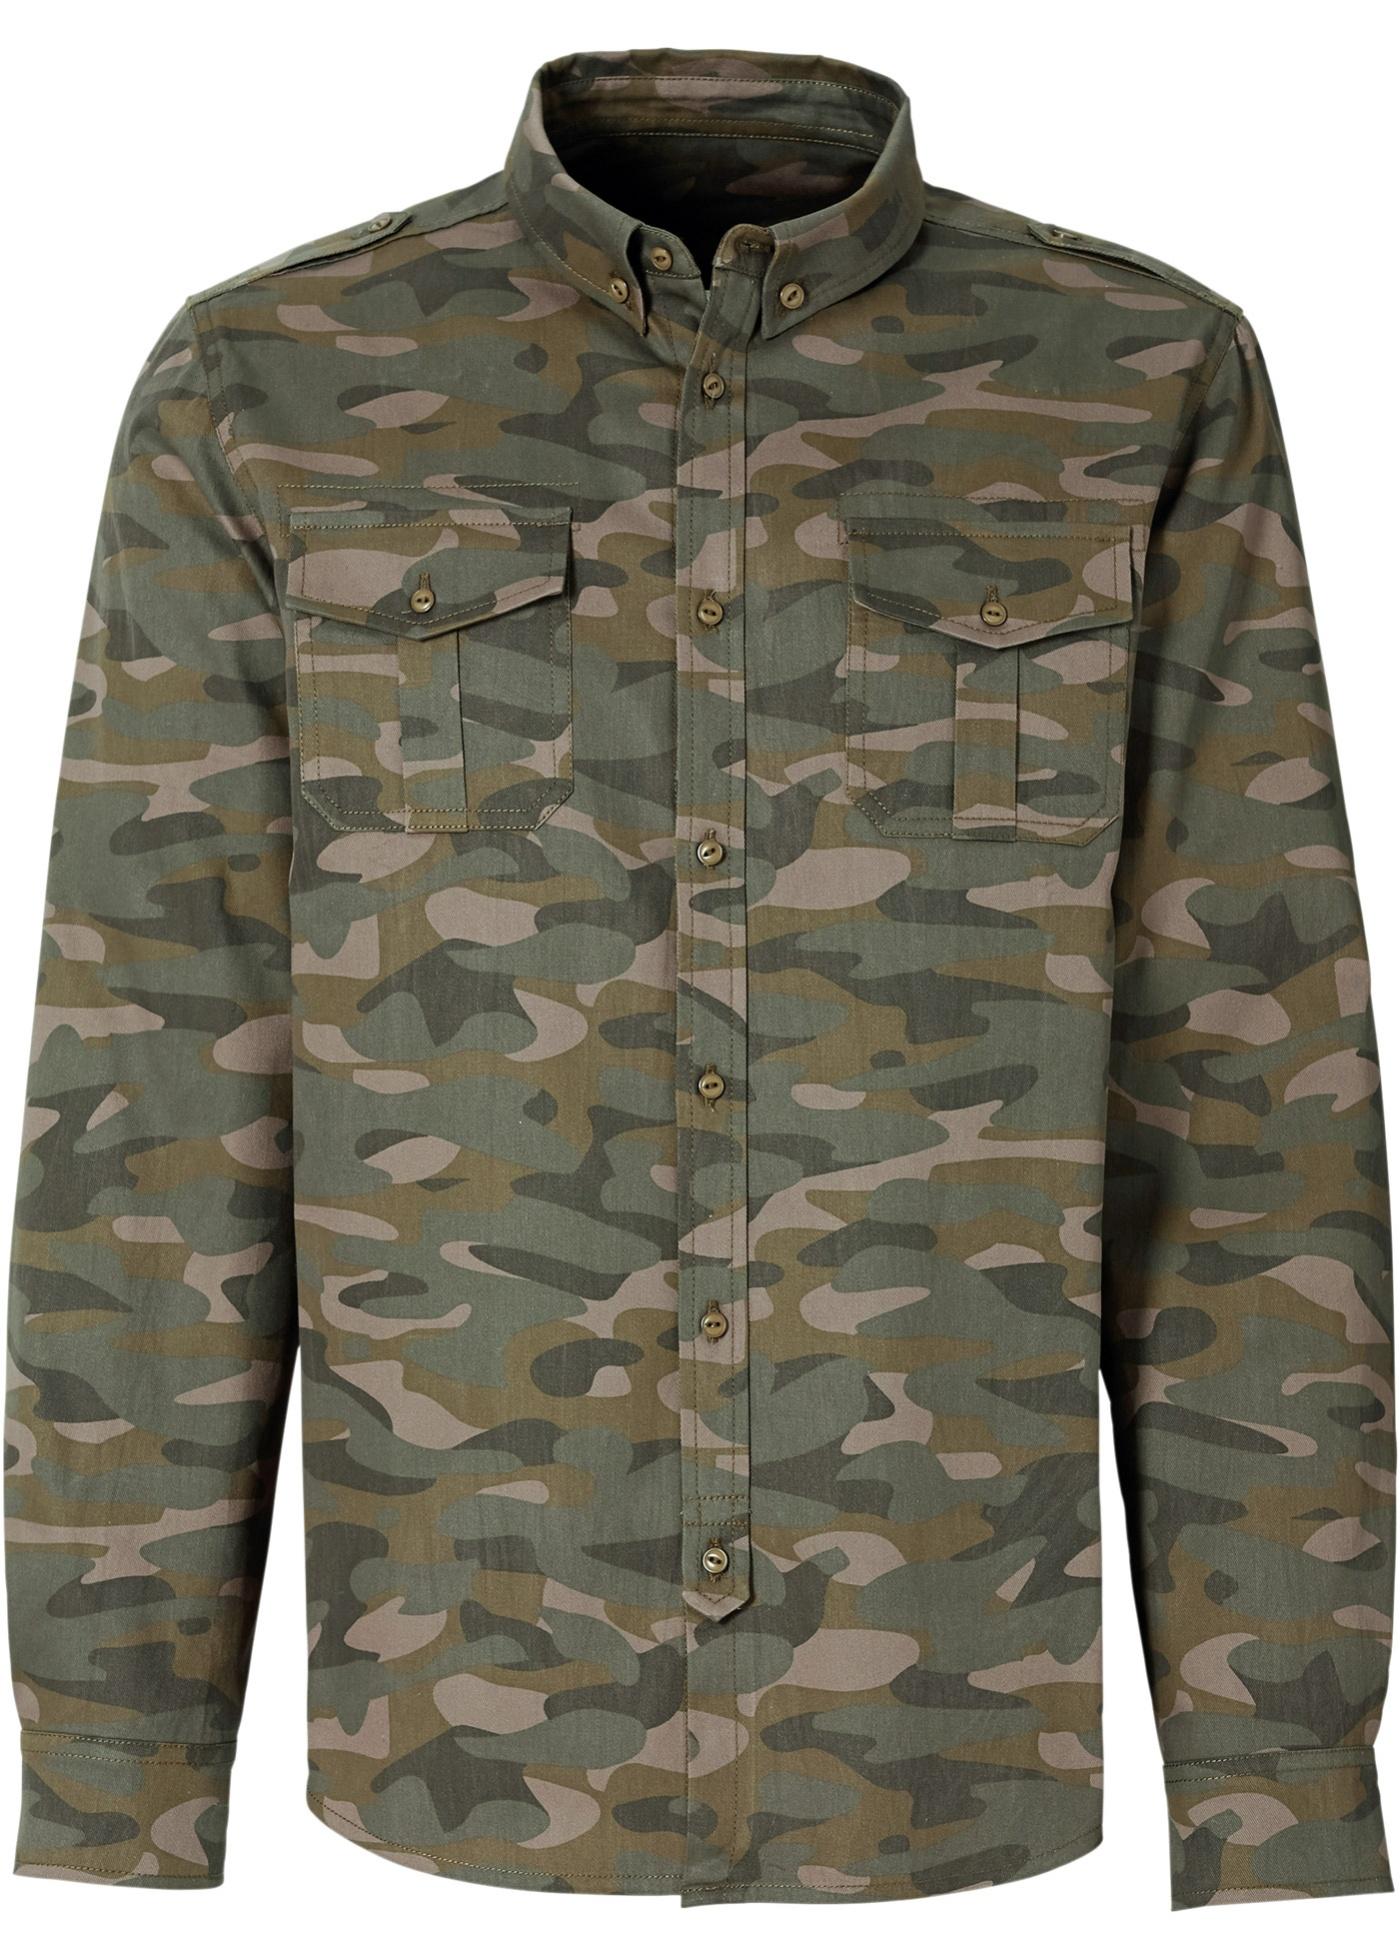 RAINBOW Langarmhemd in grün für Herren von bonprix Herrenmode Herrenbekleidung Herren Hemden Herren Hemd Langarm